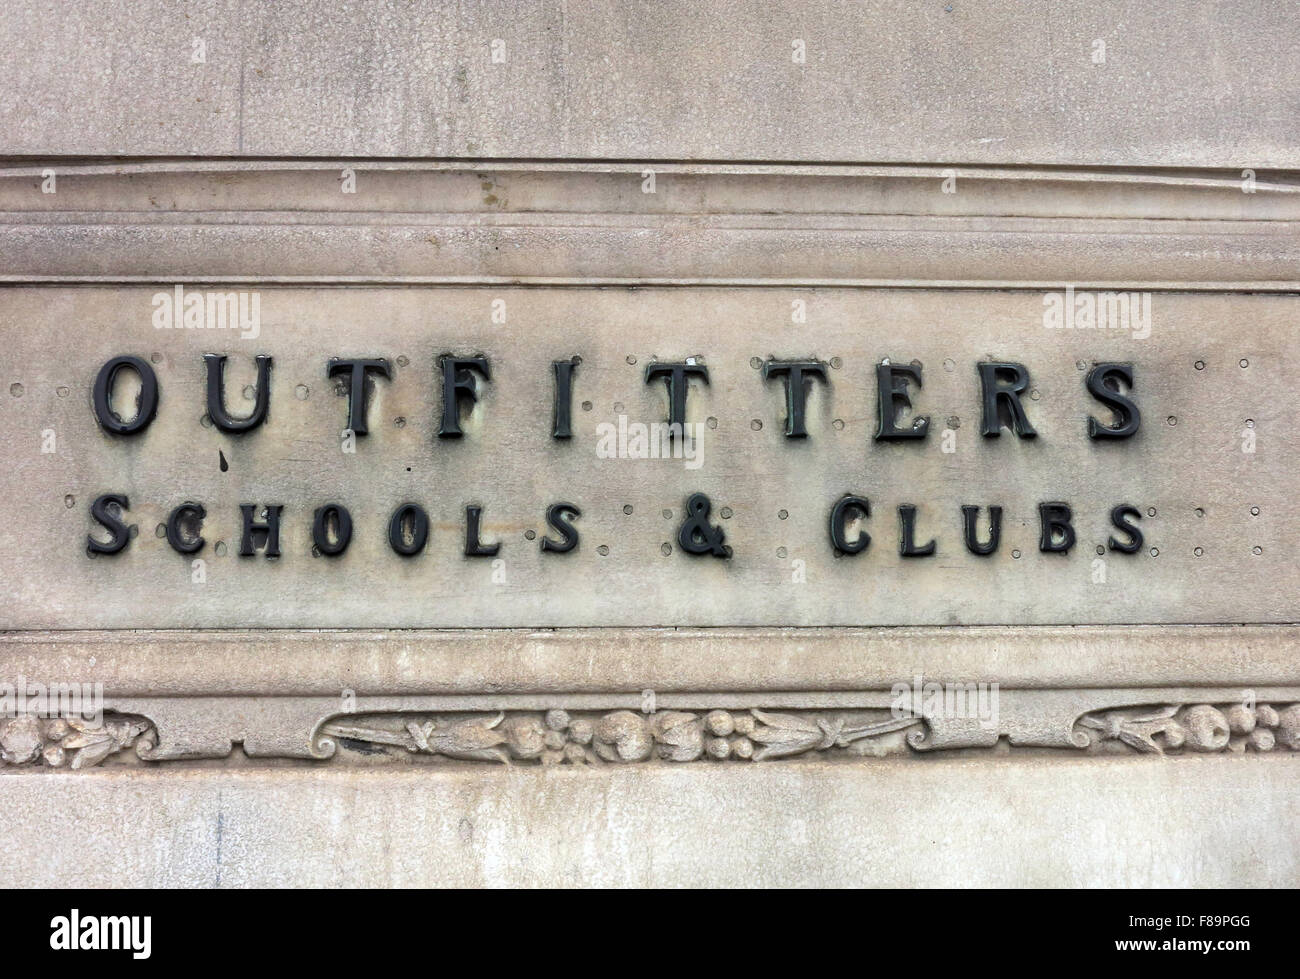 Laden Sie dieses Alamy Stockfoto Outfitters Schulen & Clubs Schild am Jenners Store, Edinburgh, Schottland - F89PGG